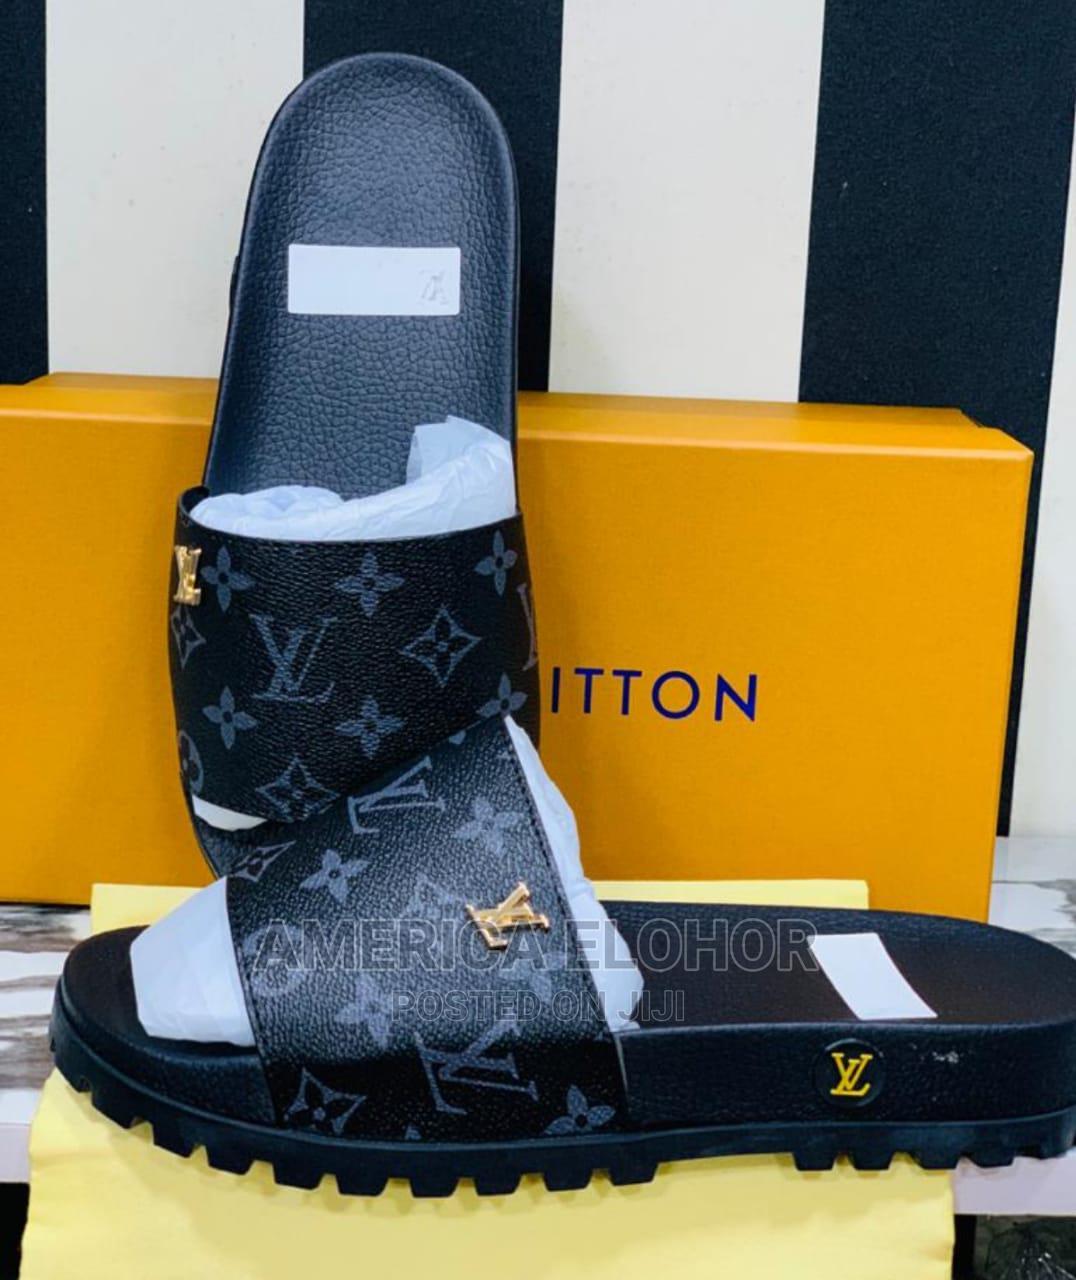 Logan Palm | Shoes for sale in Warri, Delta State, Nigeria